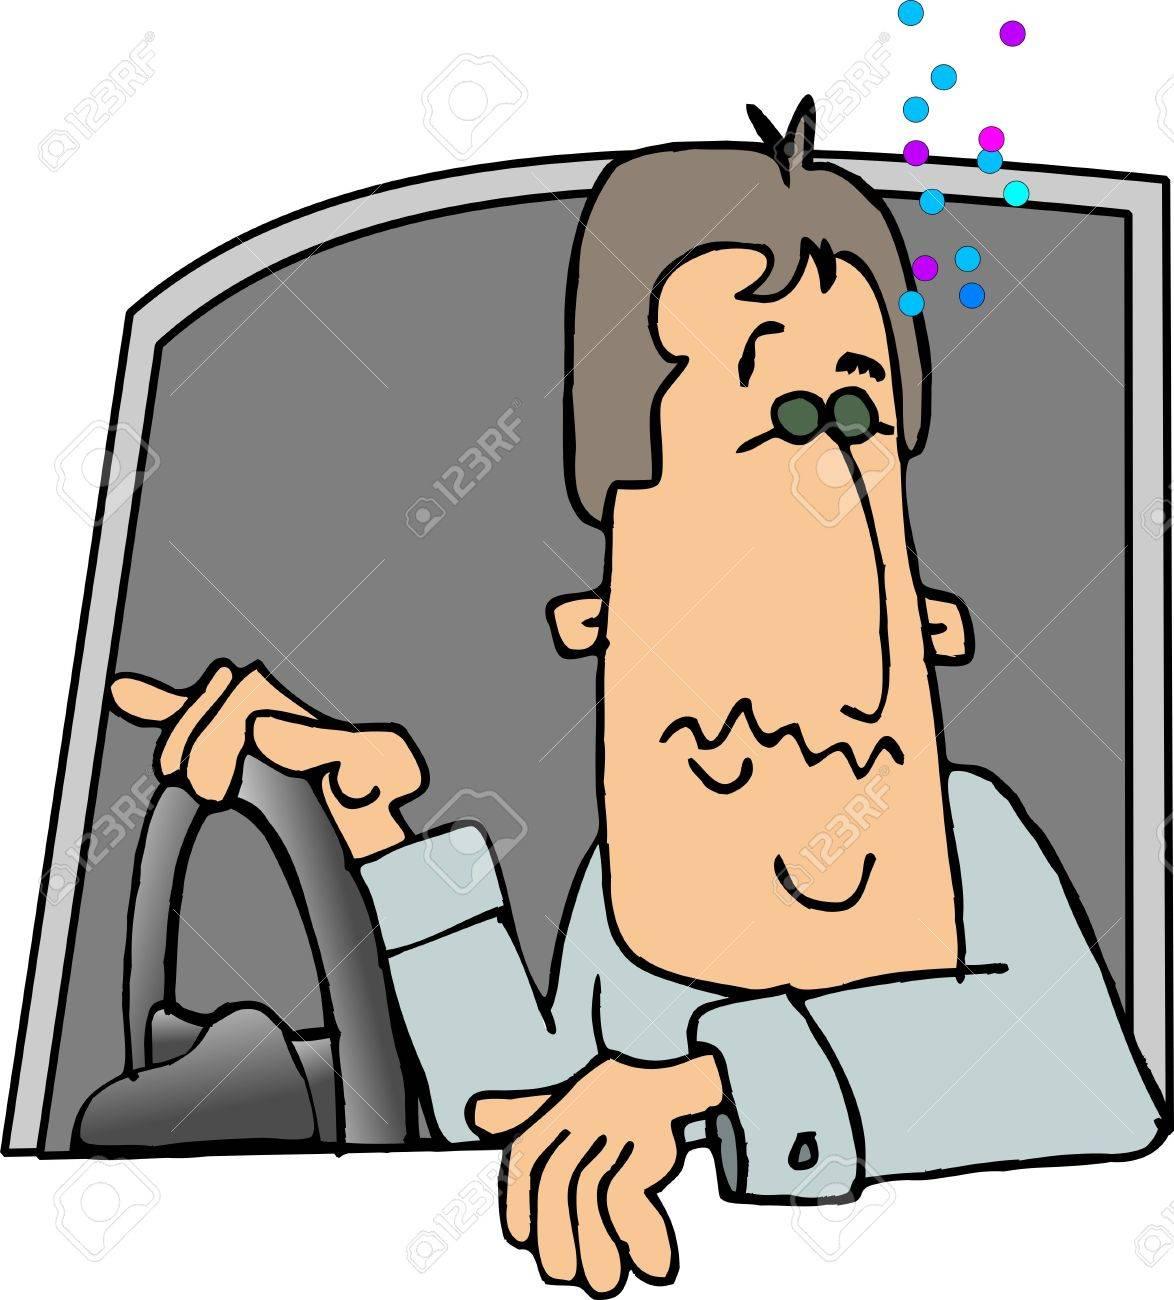 Drunk driver Stock Photo - 392843